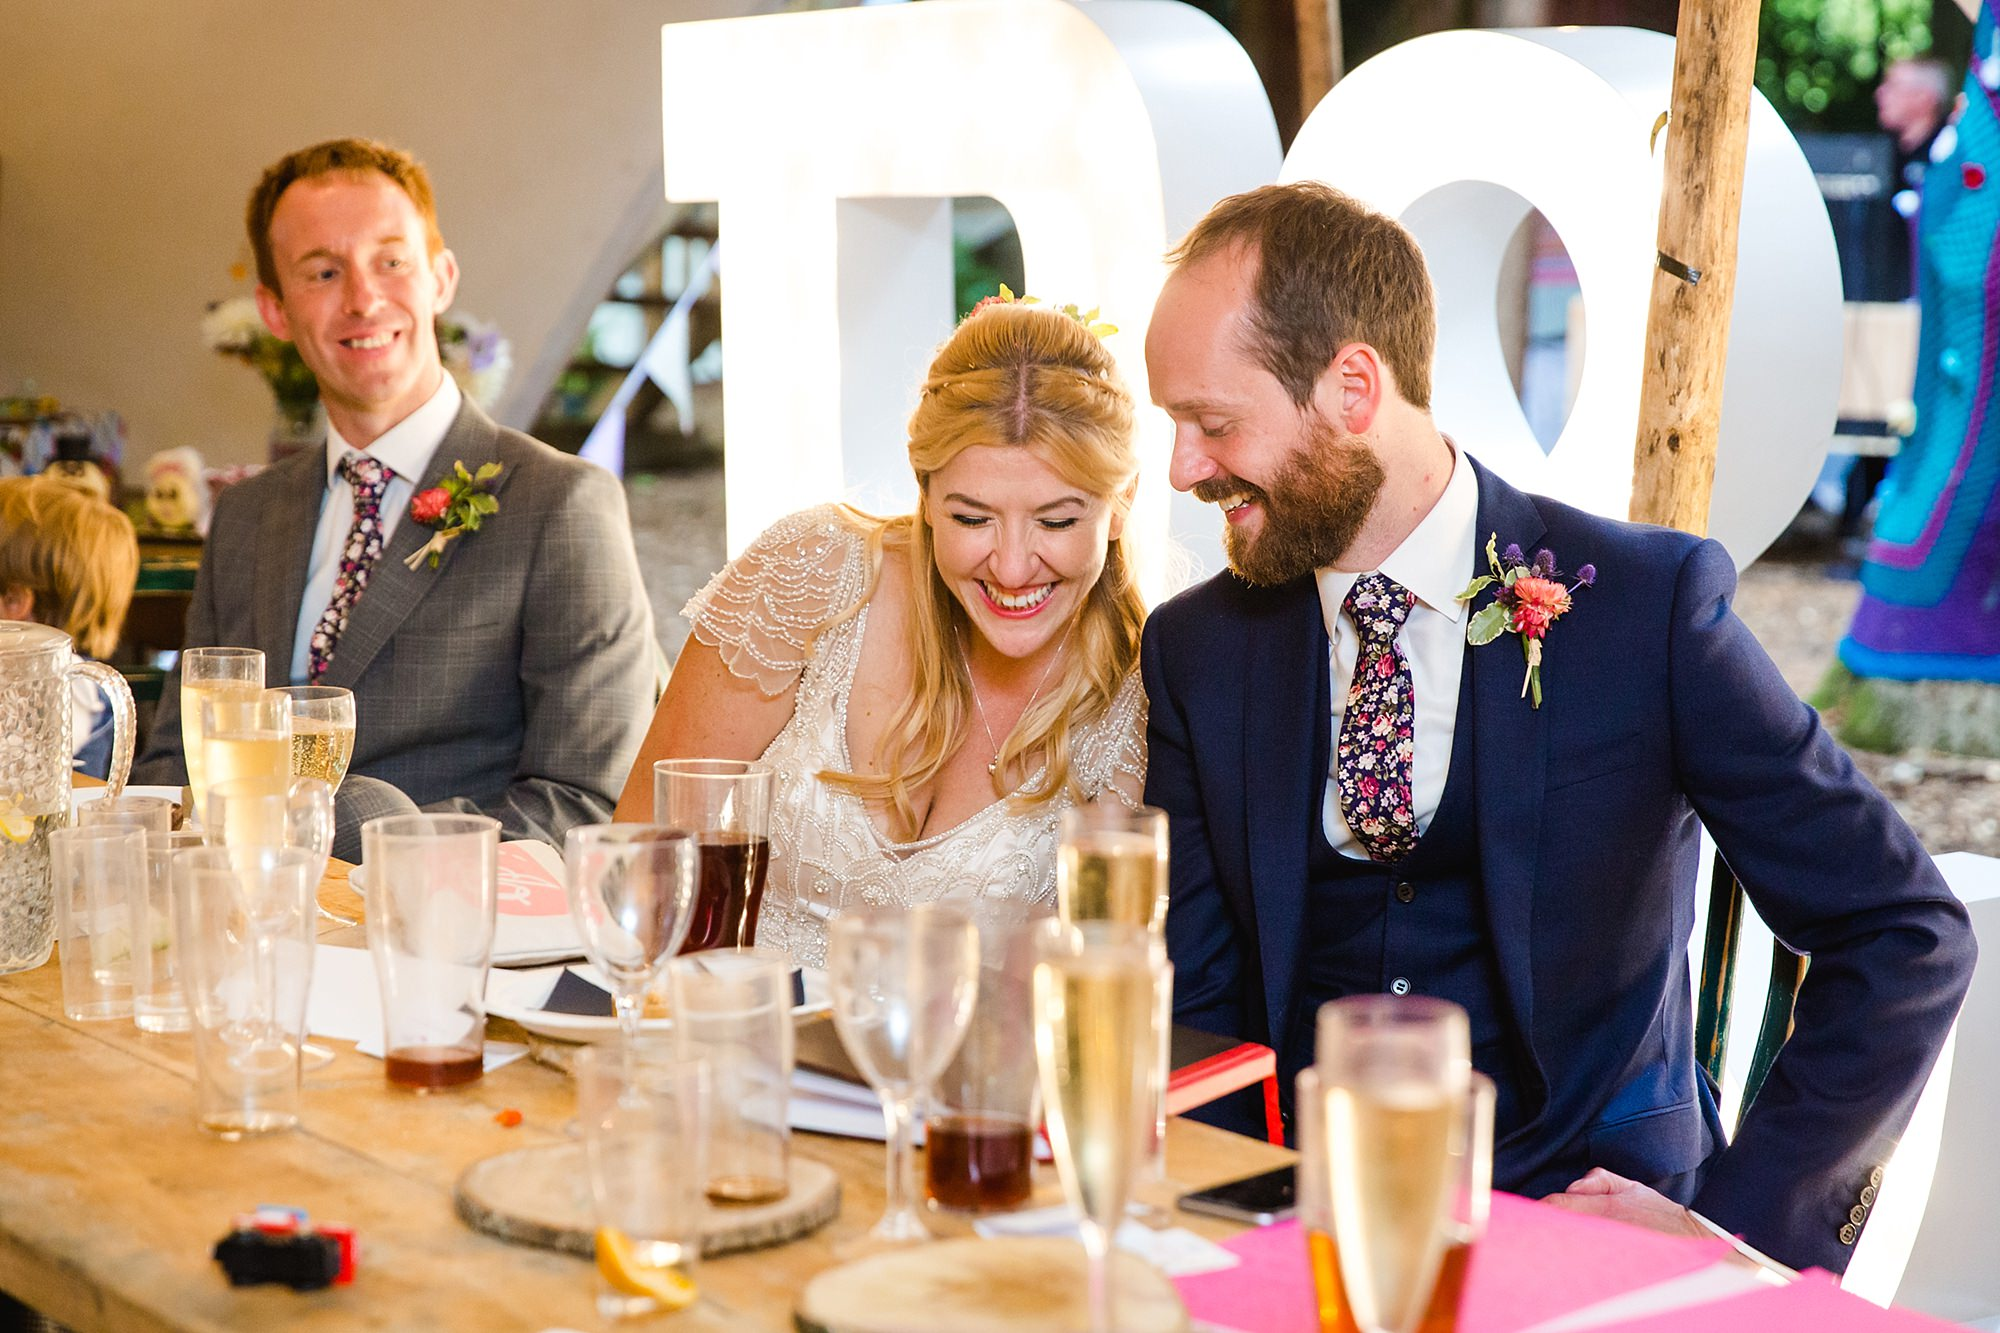 Woodland Weddings Tring bride and groom during dinner